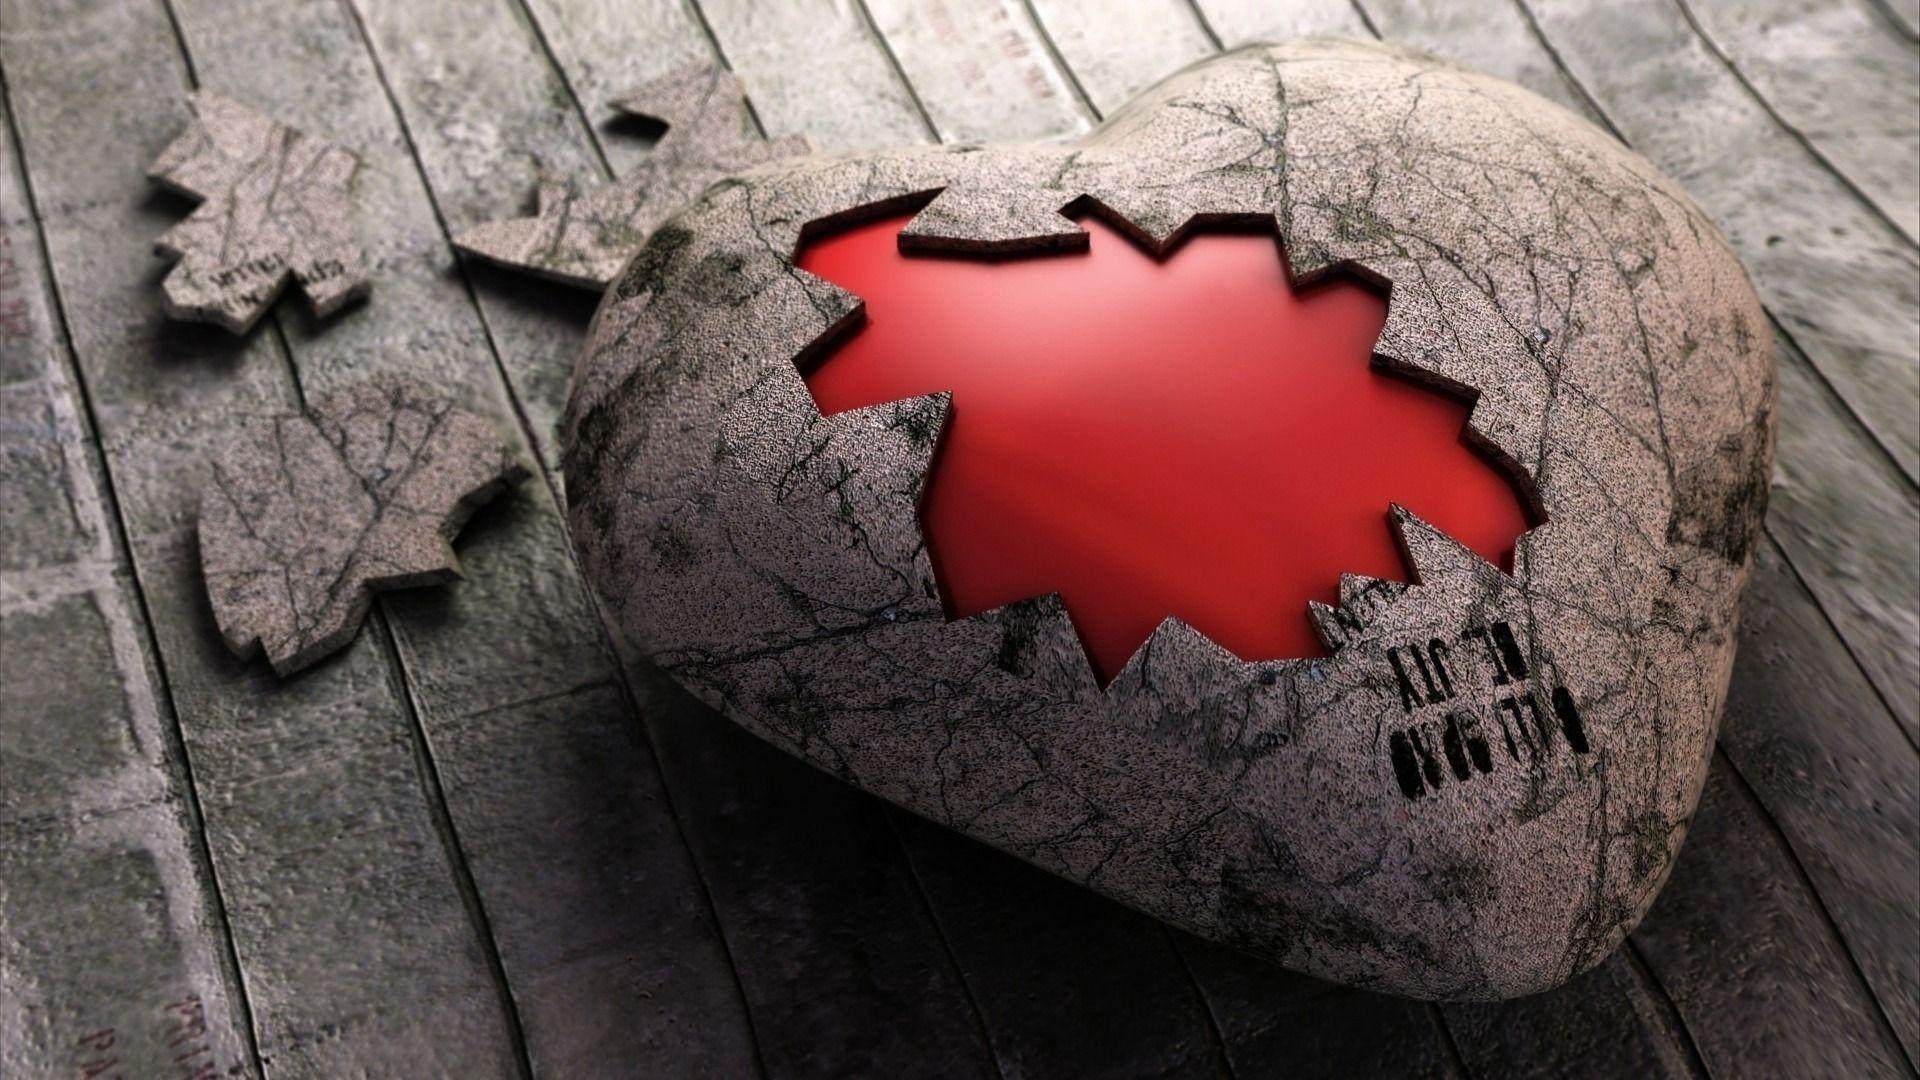 Res: 1920x1080, Broken Heart Wallpapers For Facebook Hd 1080p #6990 Wallpaper .